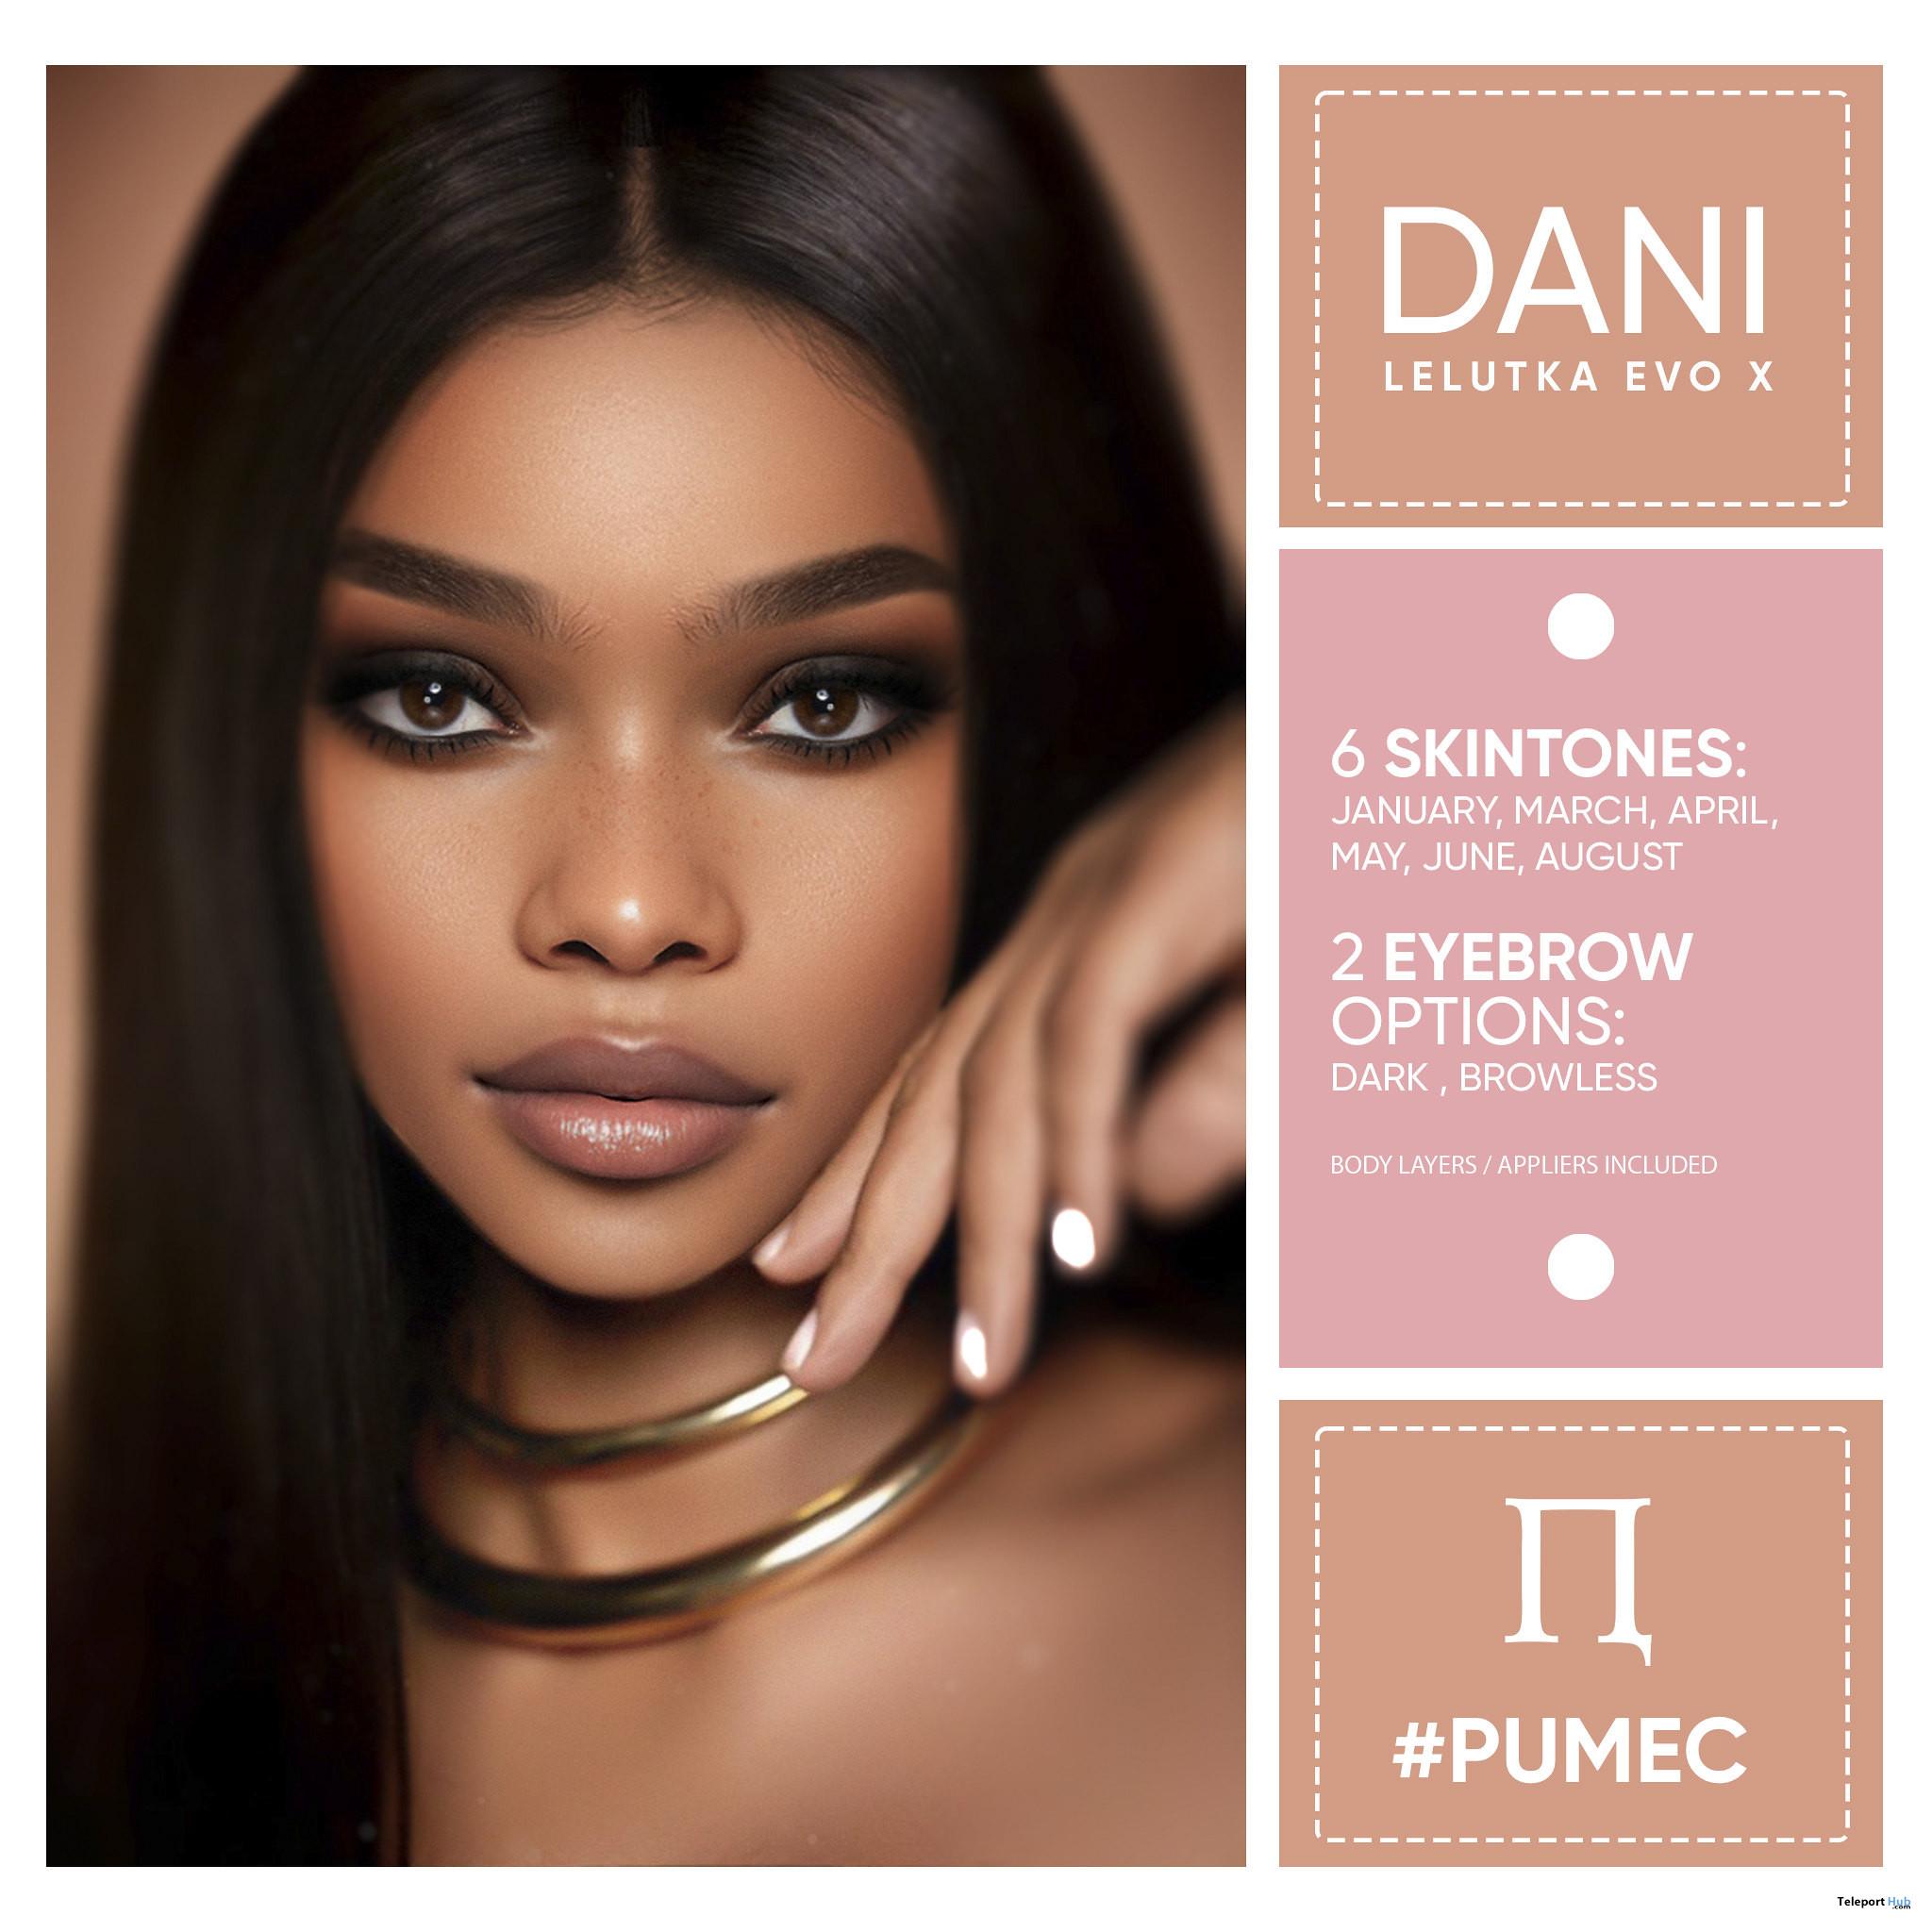 Demi Skin For Lelutka Evo X Mesh Heads July 2021 Group Gift by PUMEC - Teleport Hub - teleporthub.com